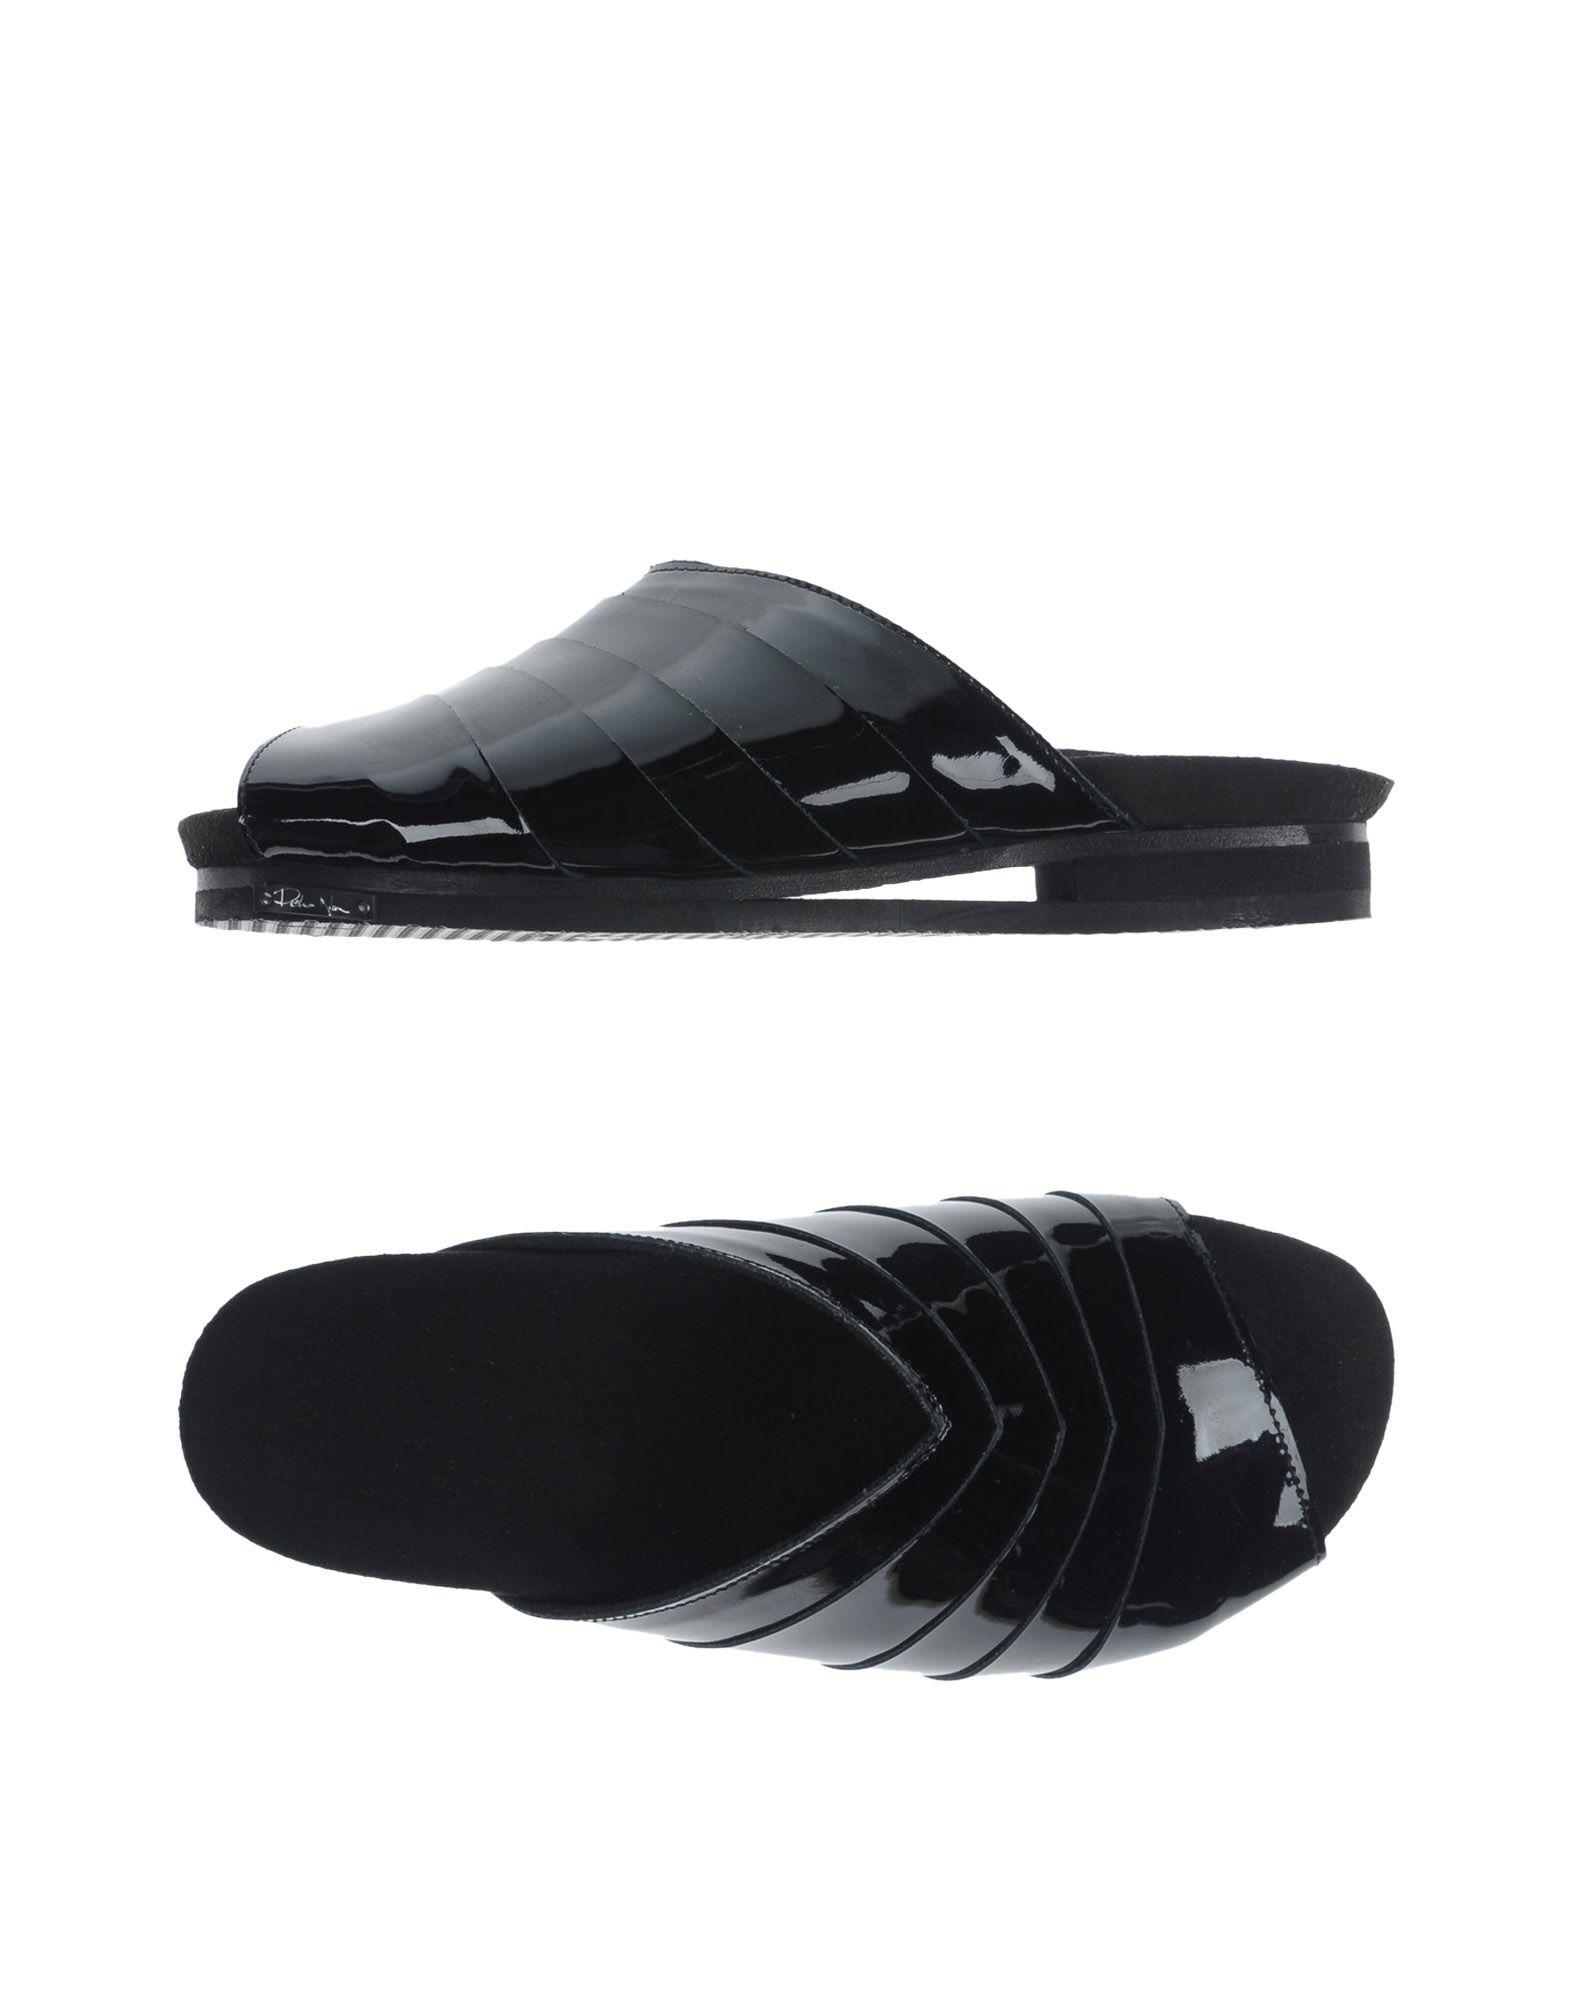 Stilvolle billige Schuhe Damen Peter Non Sandalen Damen Schuhe  11098611WP 50c079